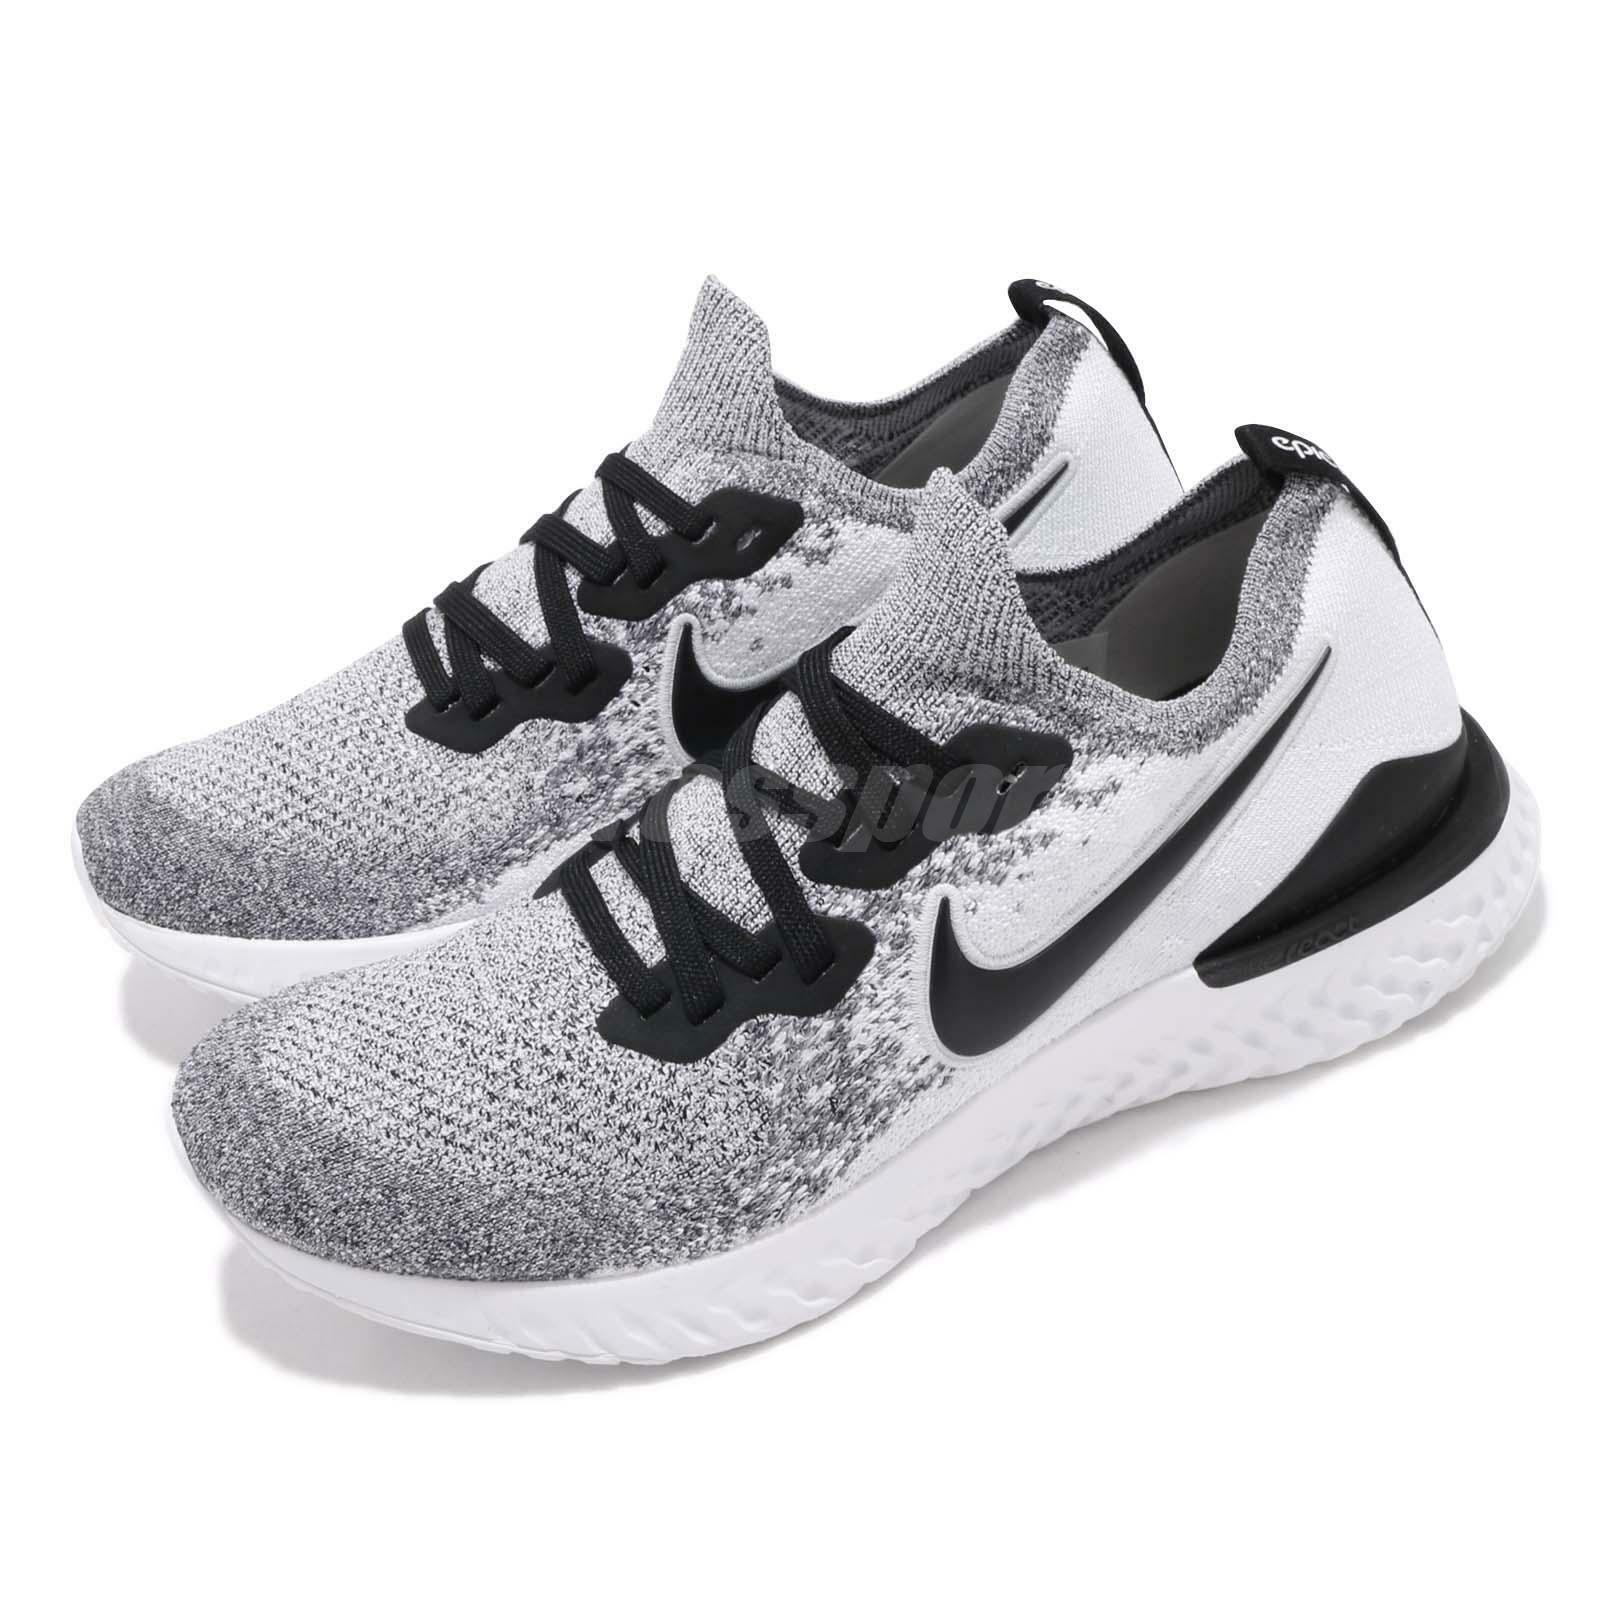 Nike Epic React Flyknit 2 White Black Men Running shoes Sneakers BQ8928-101